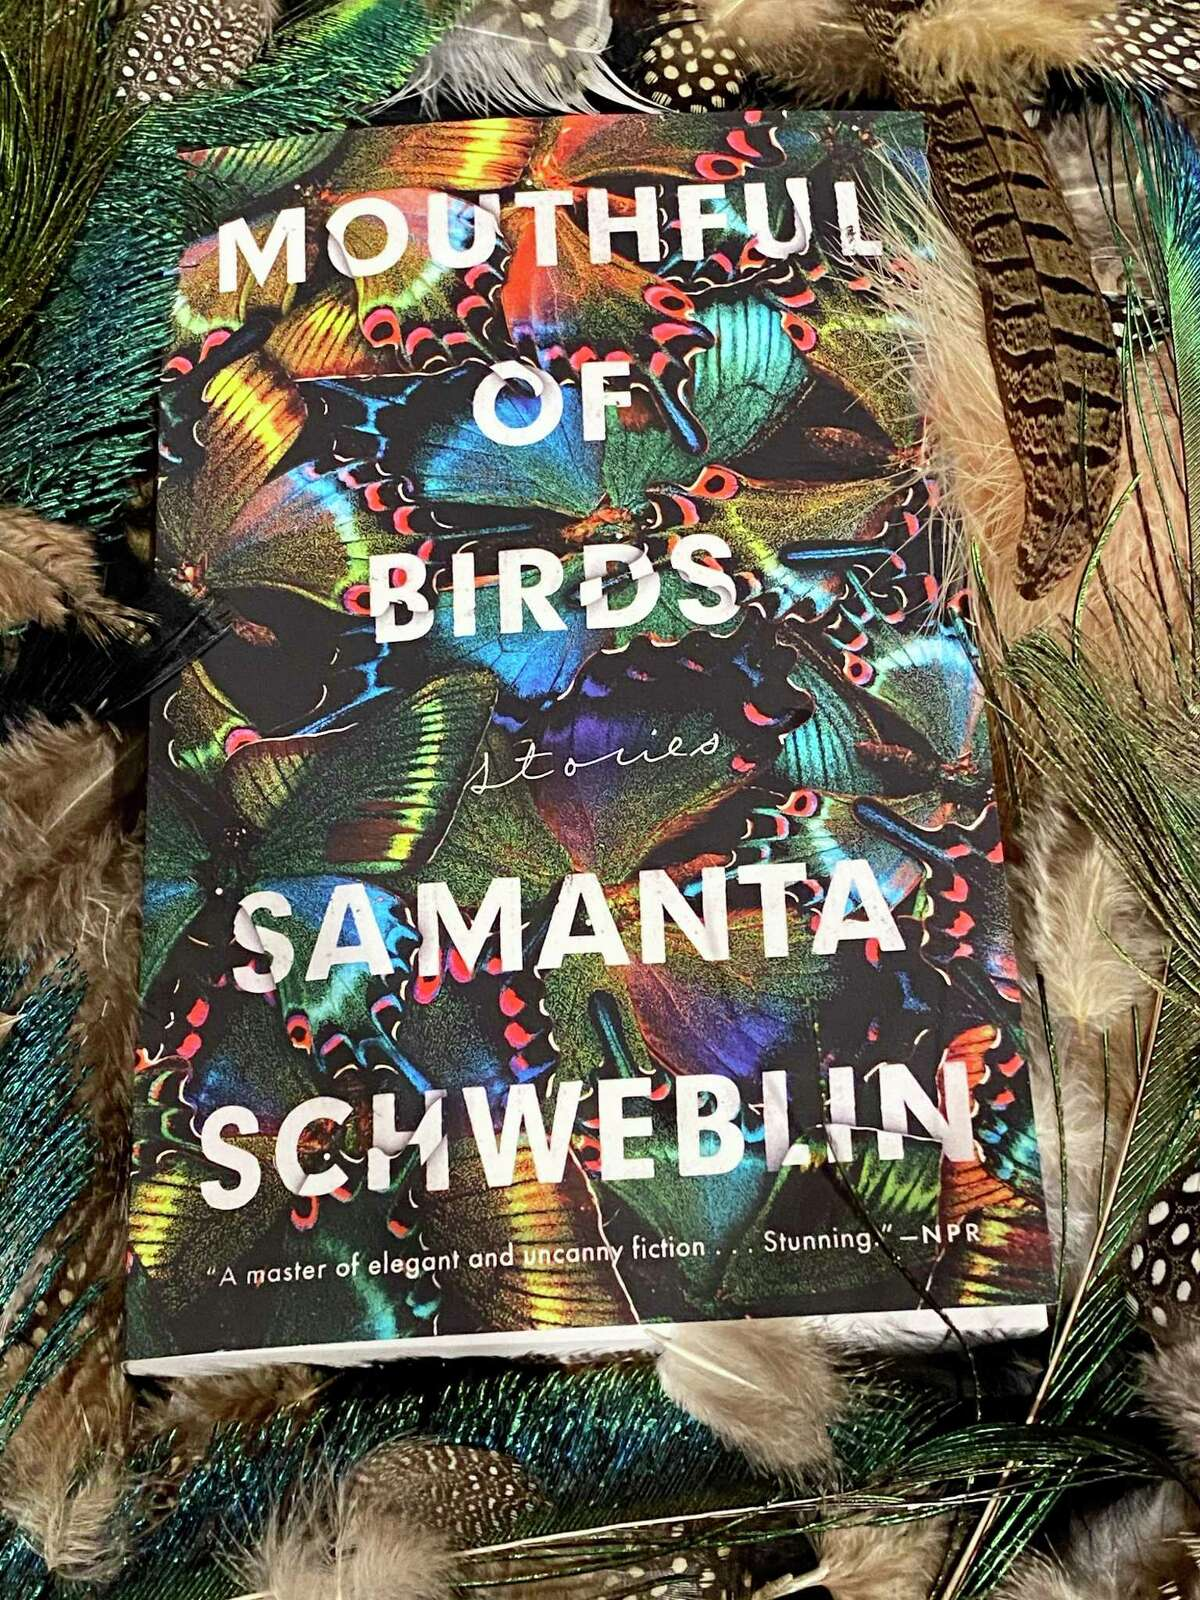 """Mouthful of Birds"" by Samanta Schweblin was published on Jan. 7."